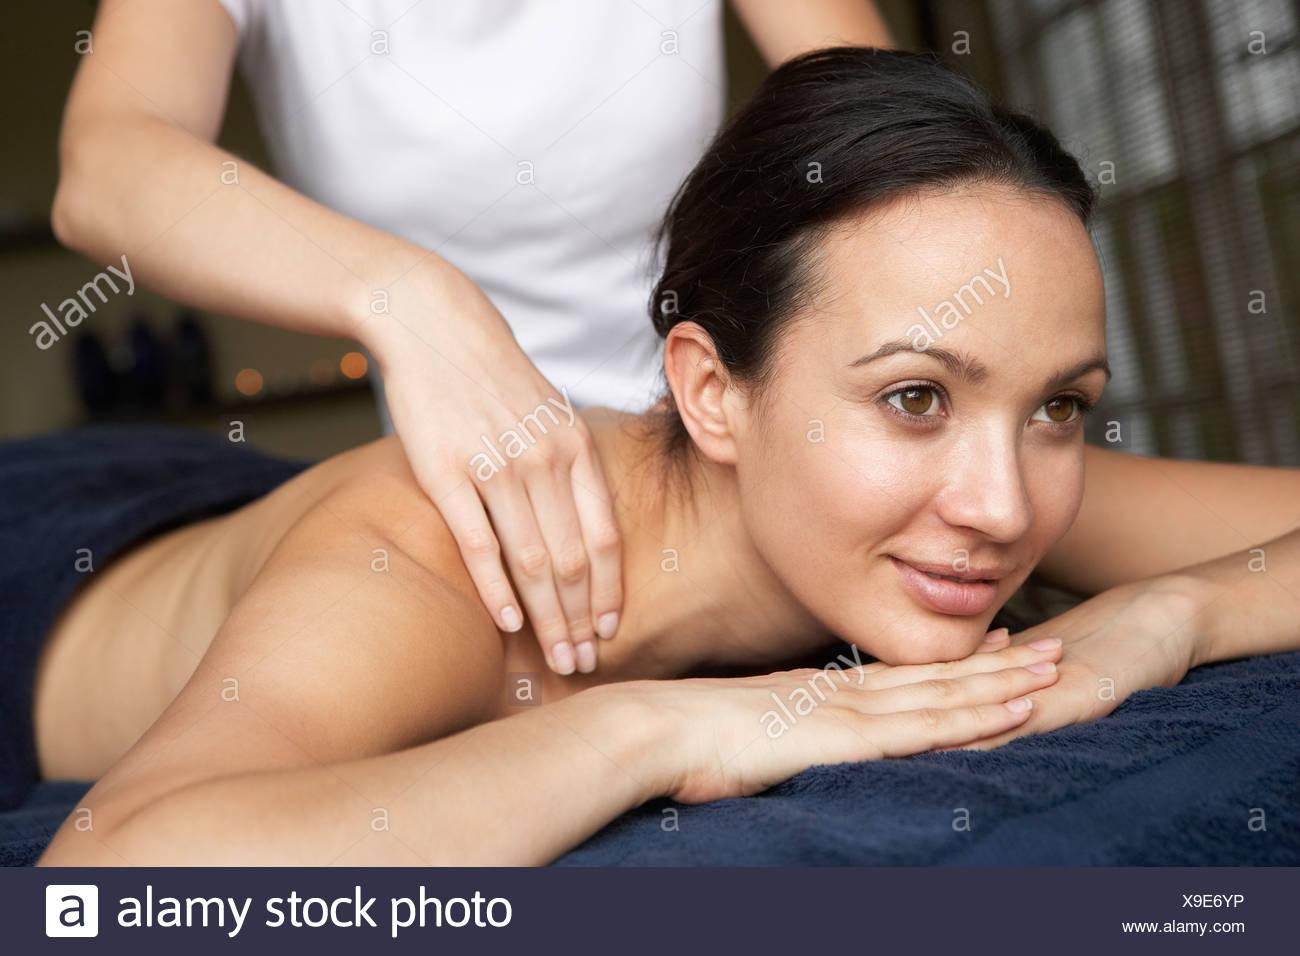 Young Woman Enjoying Massage - Stock Image